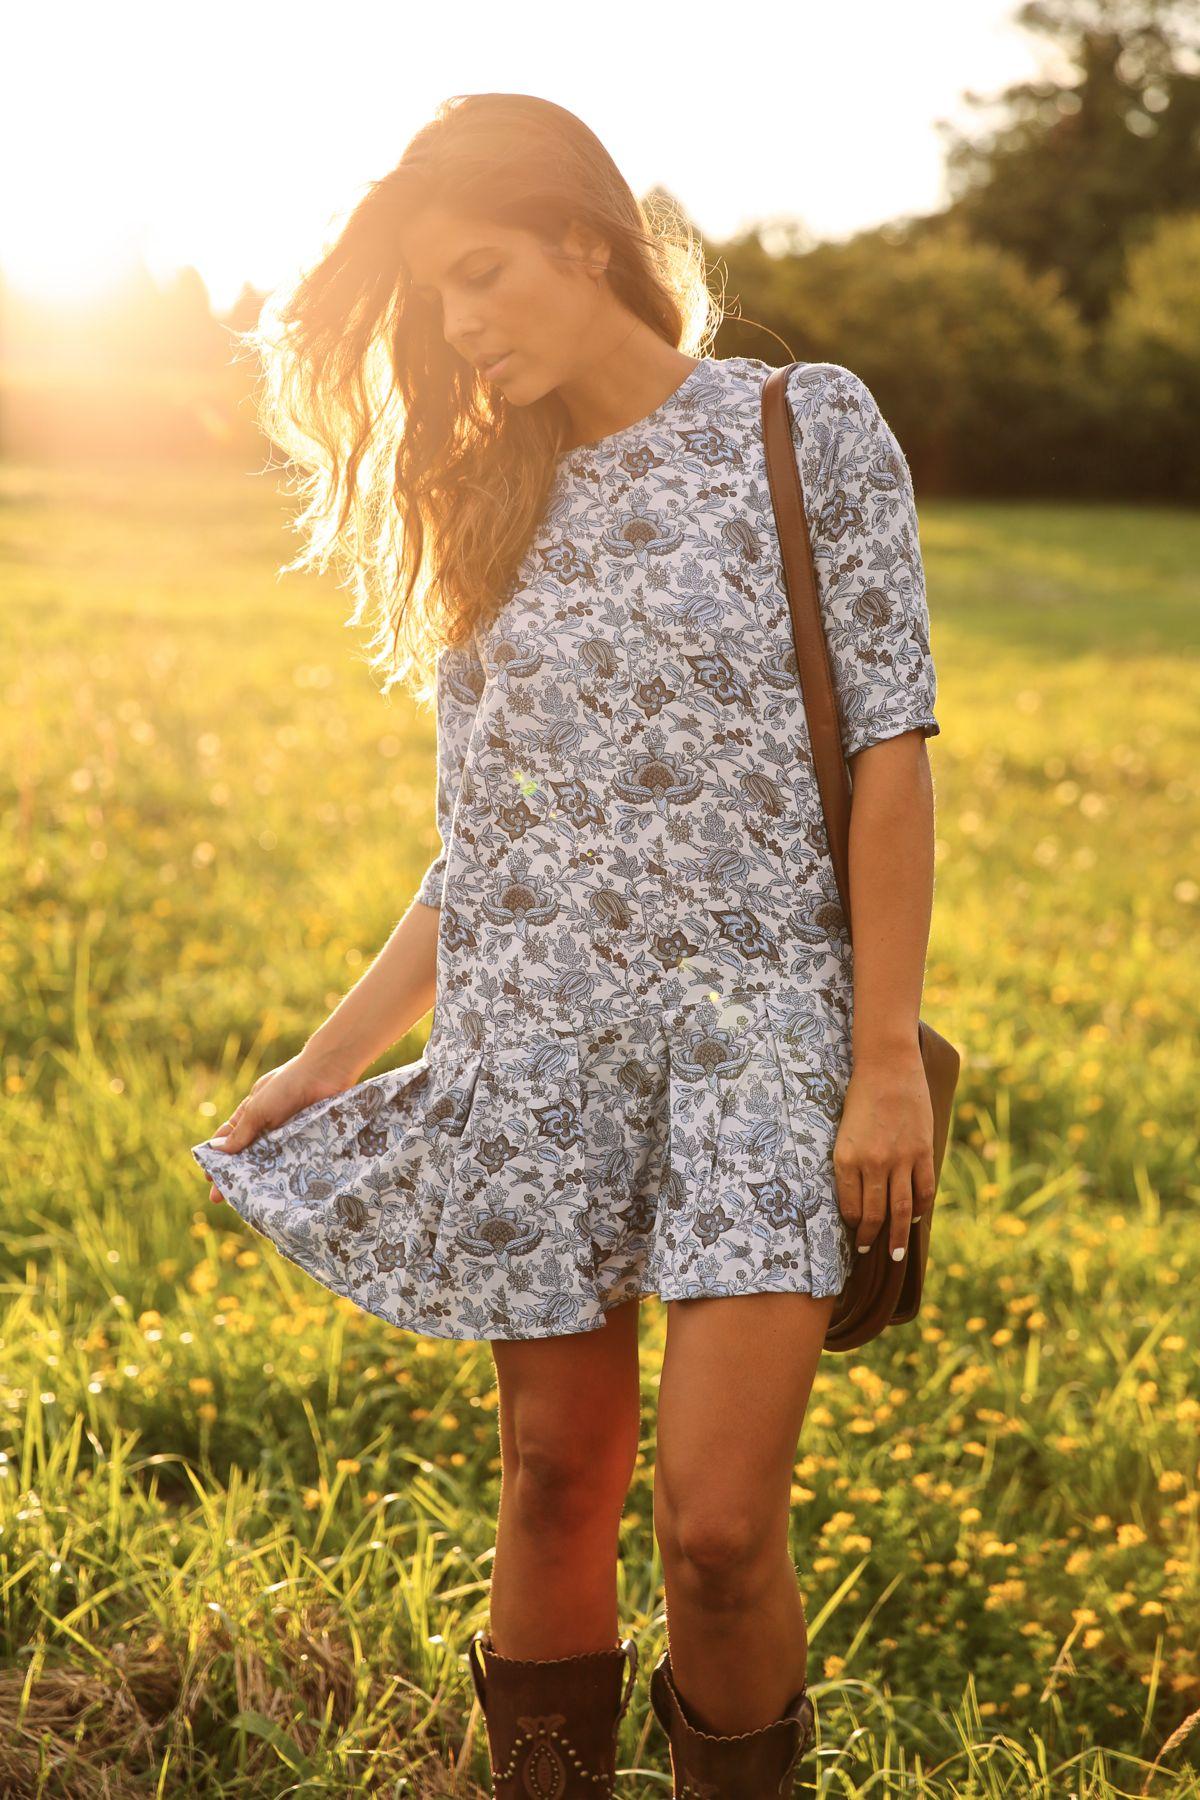 trendy_taste-look-outfit-street_style-ootd-blog-blogger-fashion_spain-moda_españa-cowboy-campero-sendra-cowboy_boots-botas_camperas-loewe-bag-bolso-vestido_flores-flower_print-dress-3